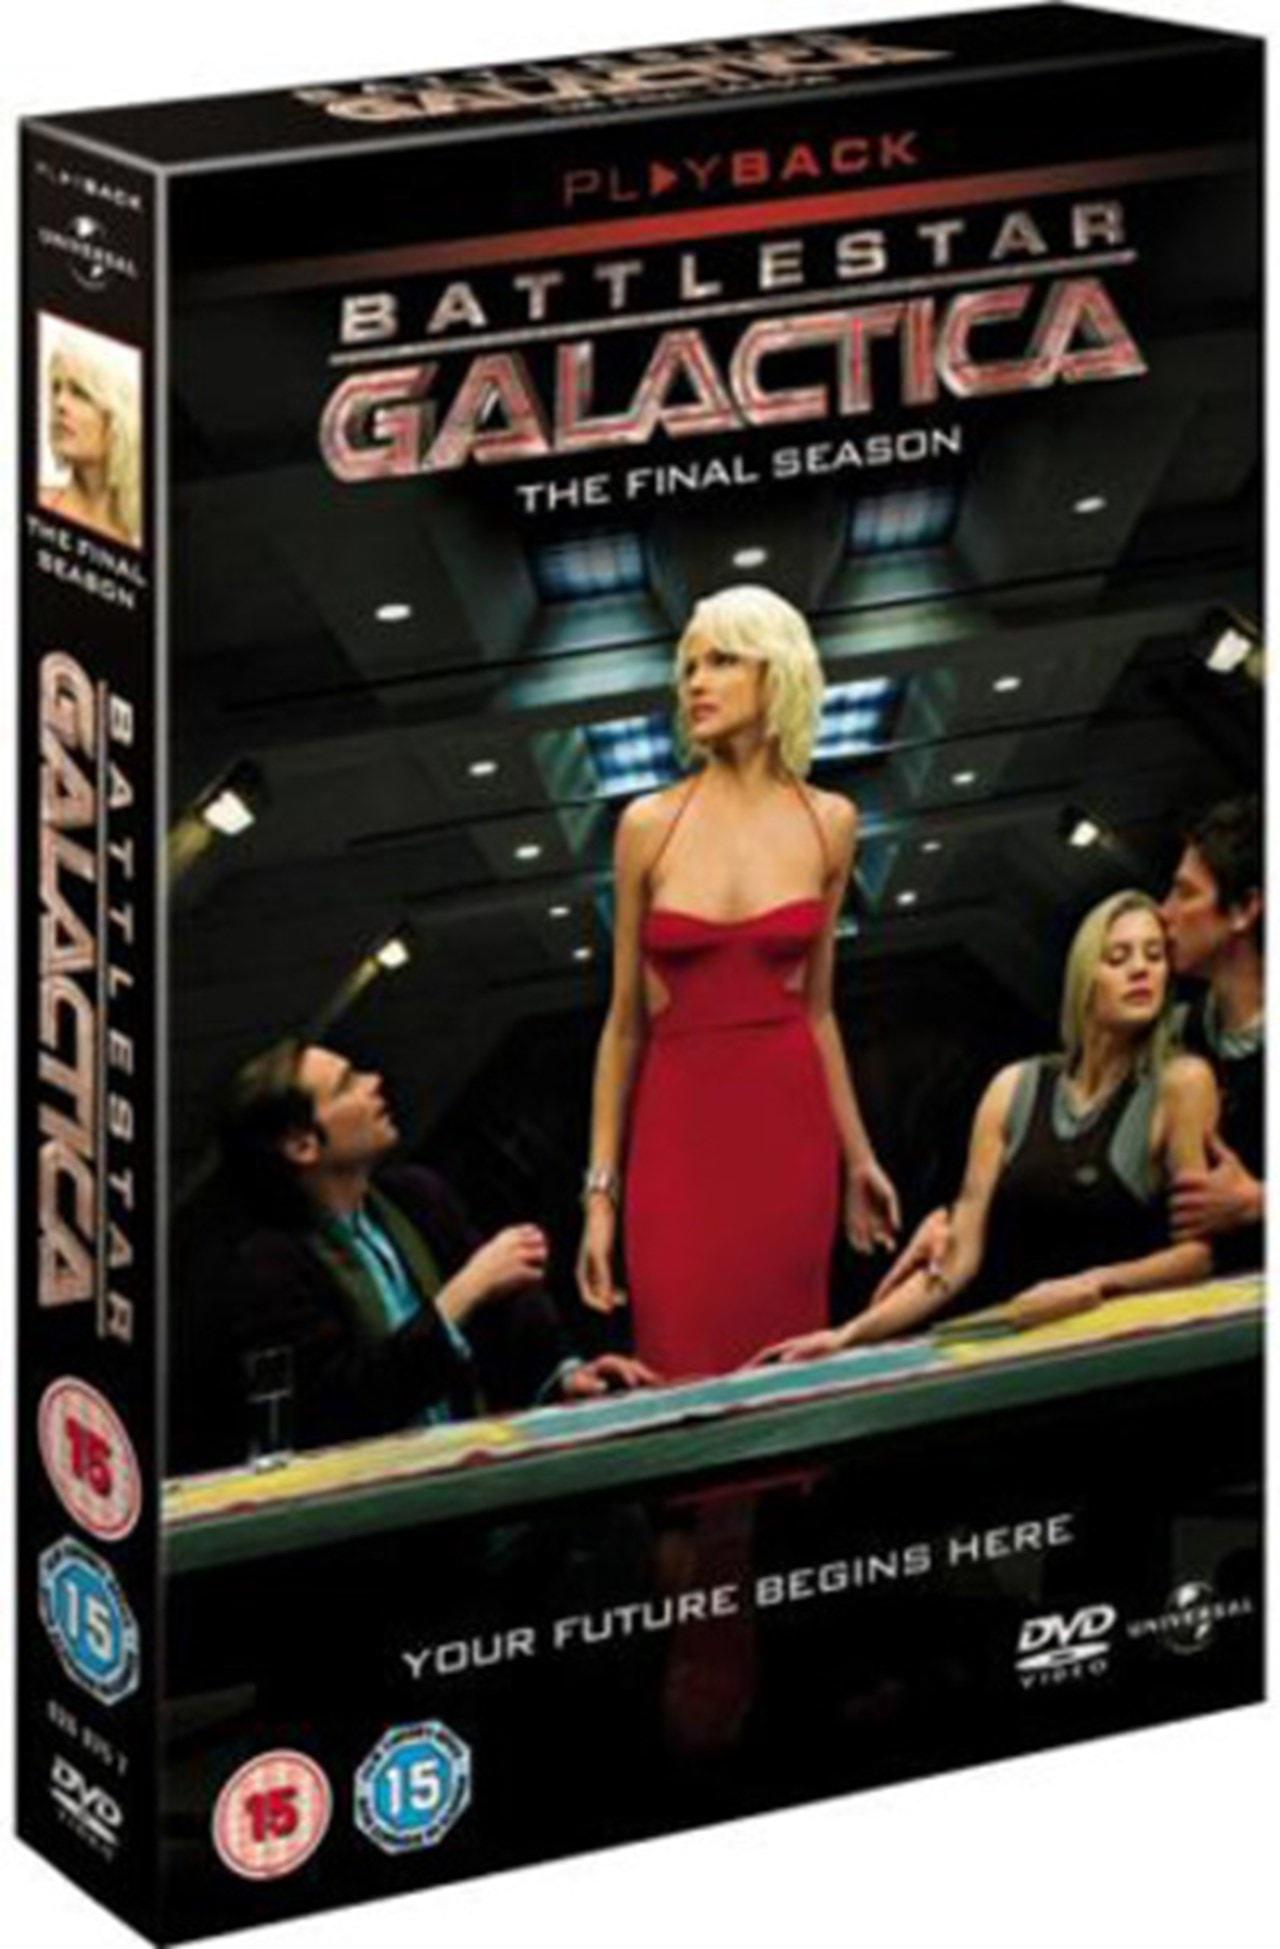 Battlestar Galactica: The Final Season - 1